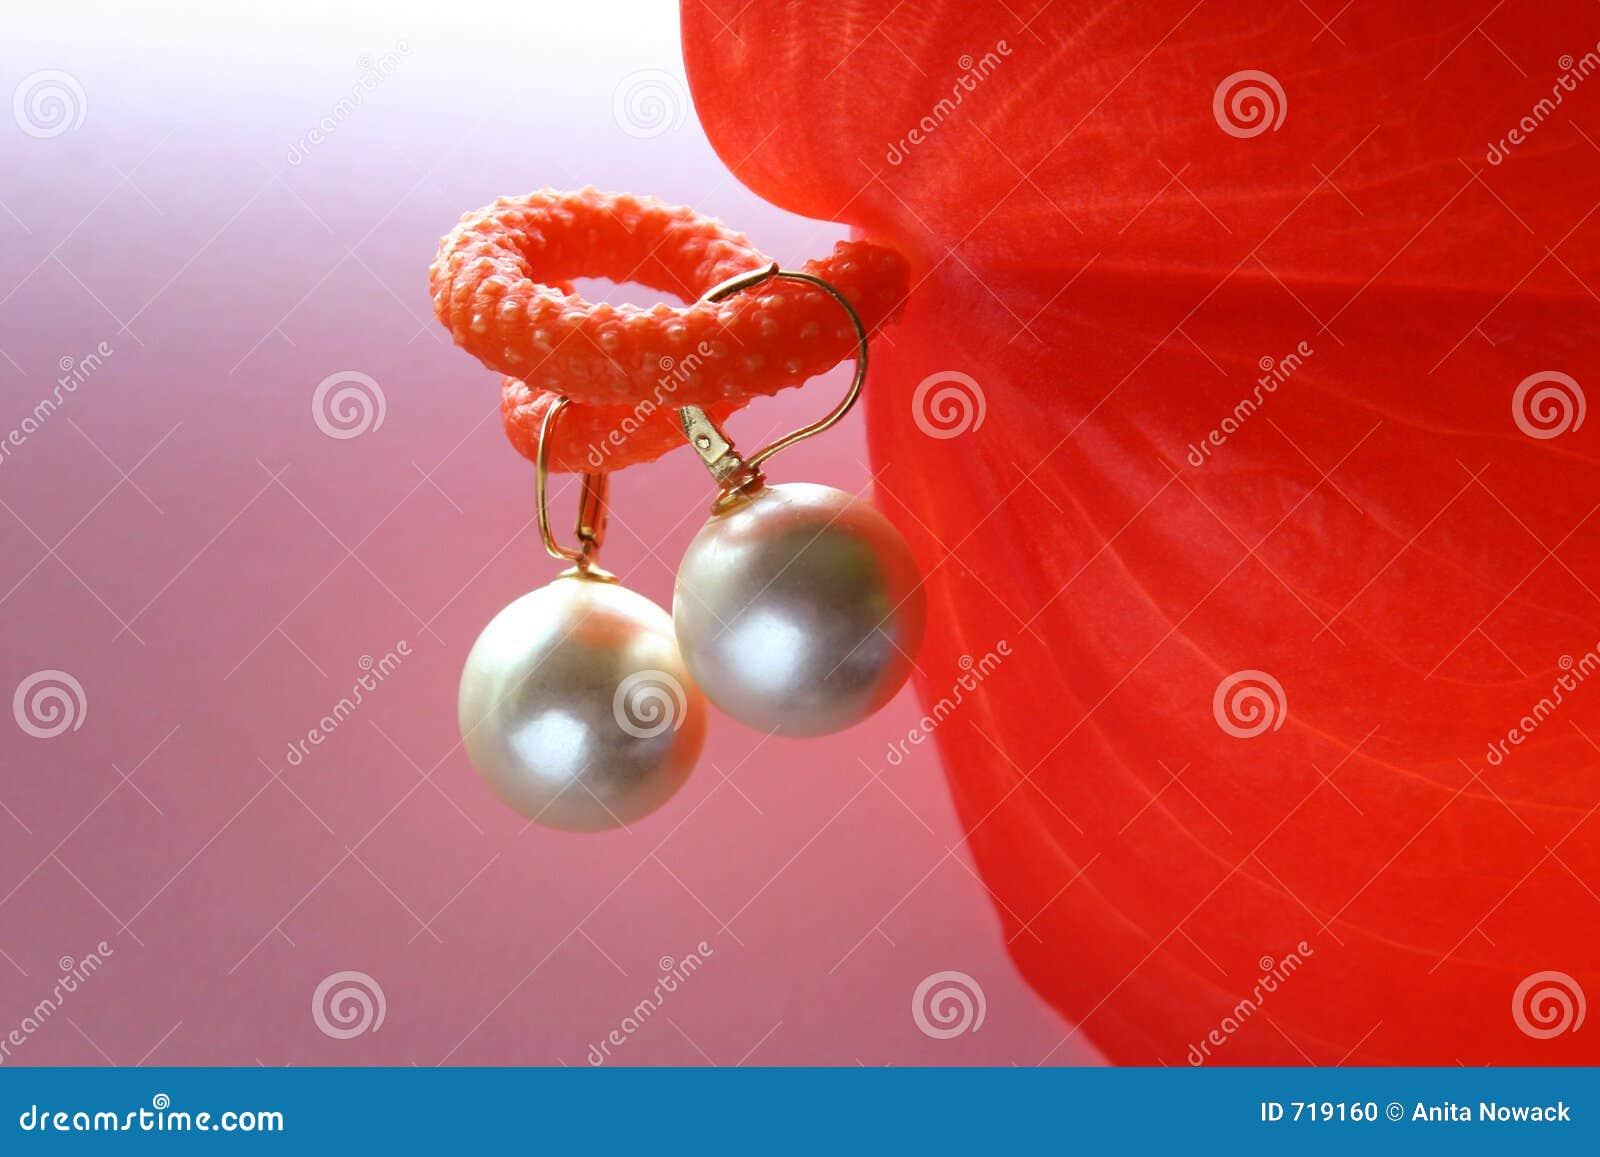 South Sea Pearls